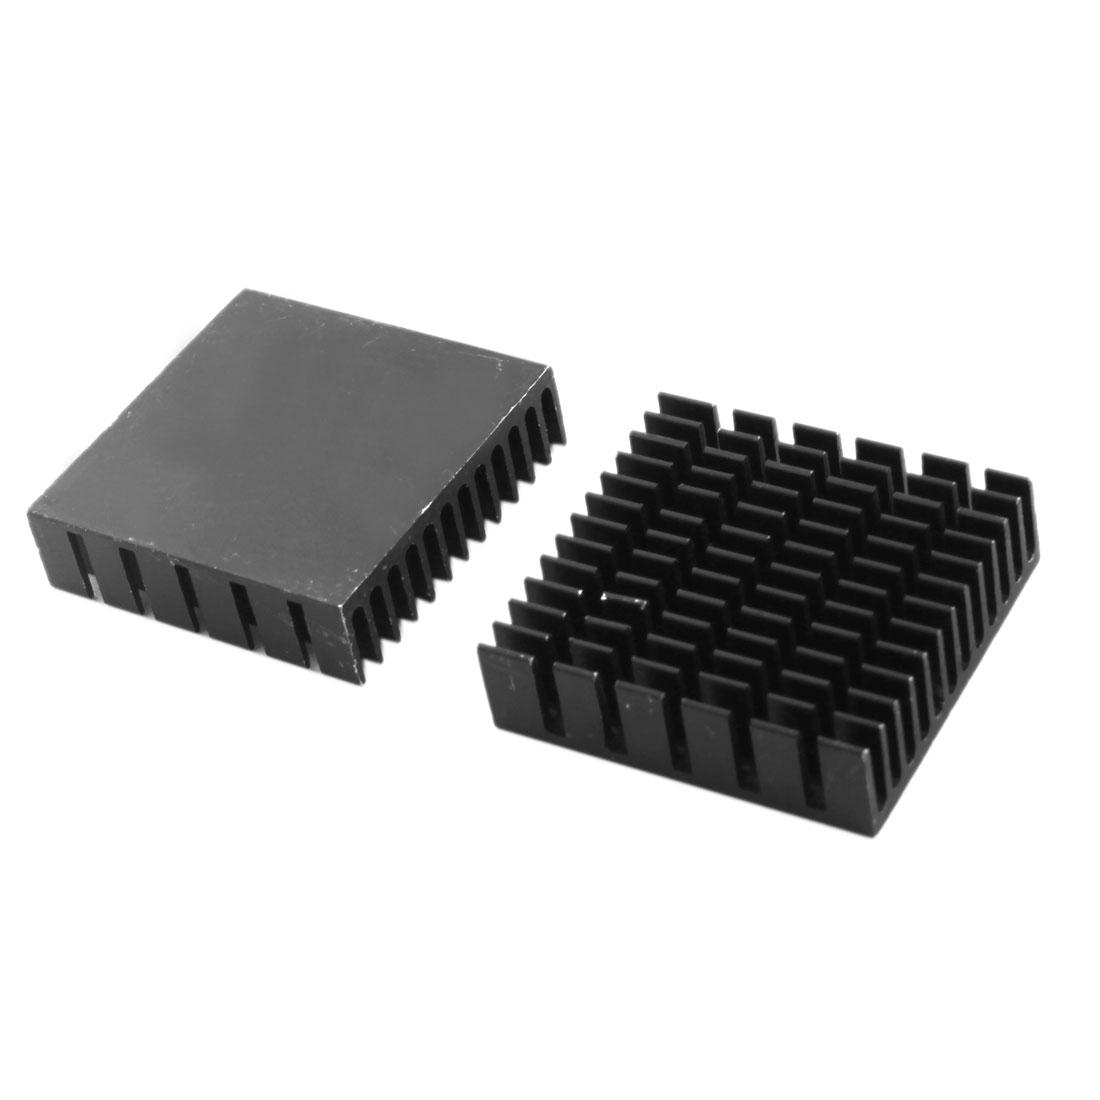 2pcs 40mm x 11mm x 40mm Black Aluminum Chipset Heat Diffuse Cooler Cooling Fin Heatsink for PCB Board